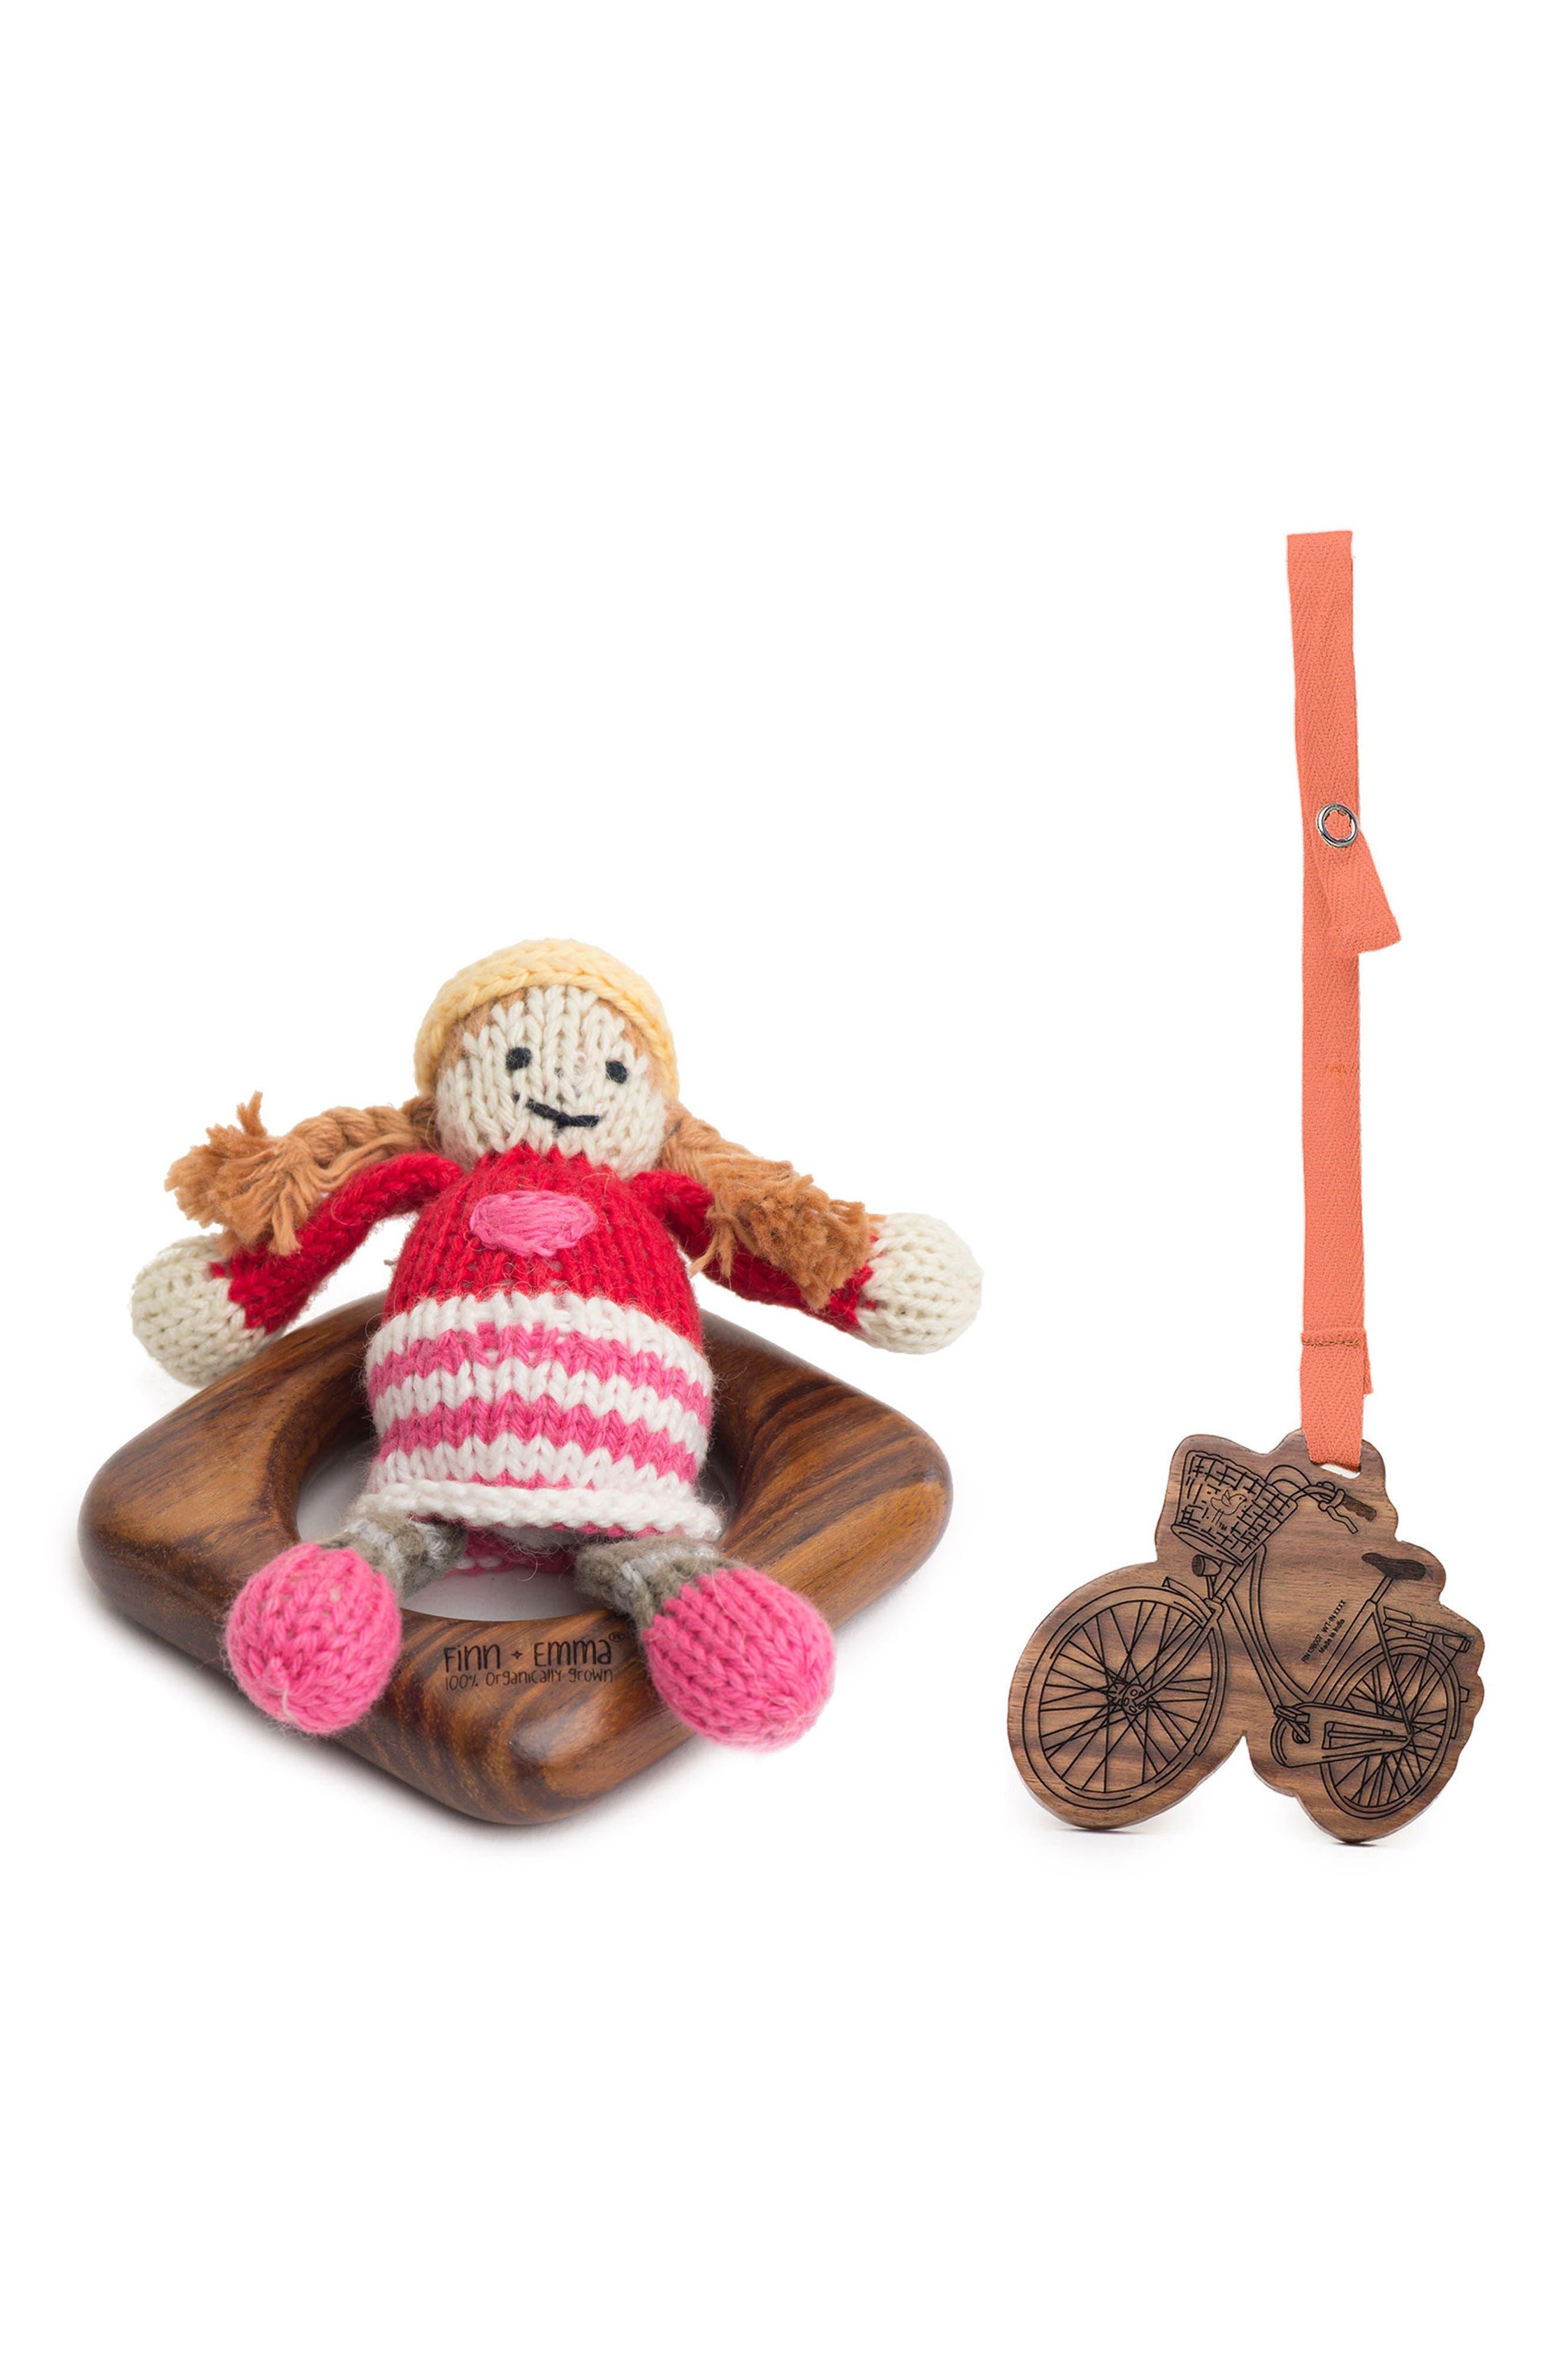 Alternate Image 1 Selected - Finn + Emma Clementine Teething Ring, Rattle & Stroller Buddy Set